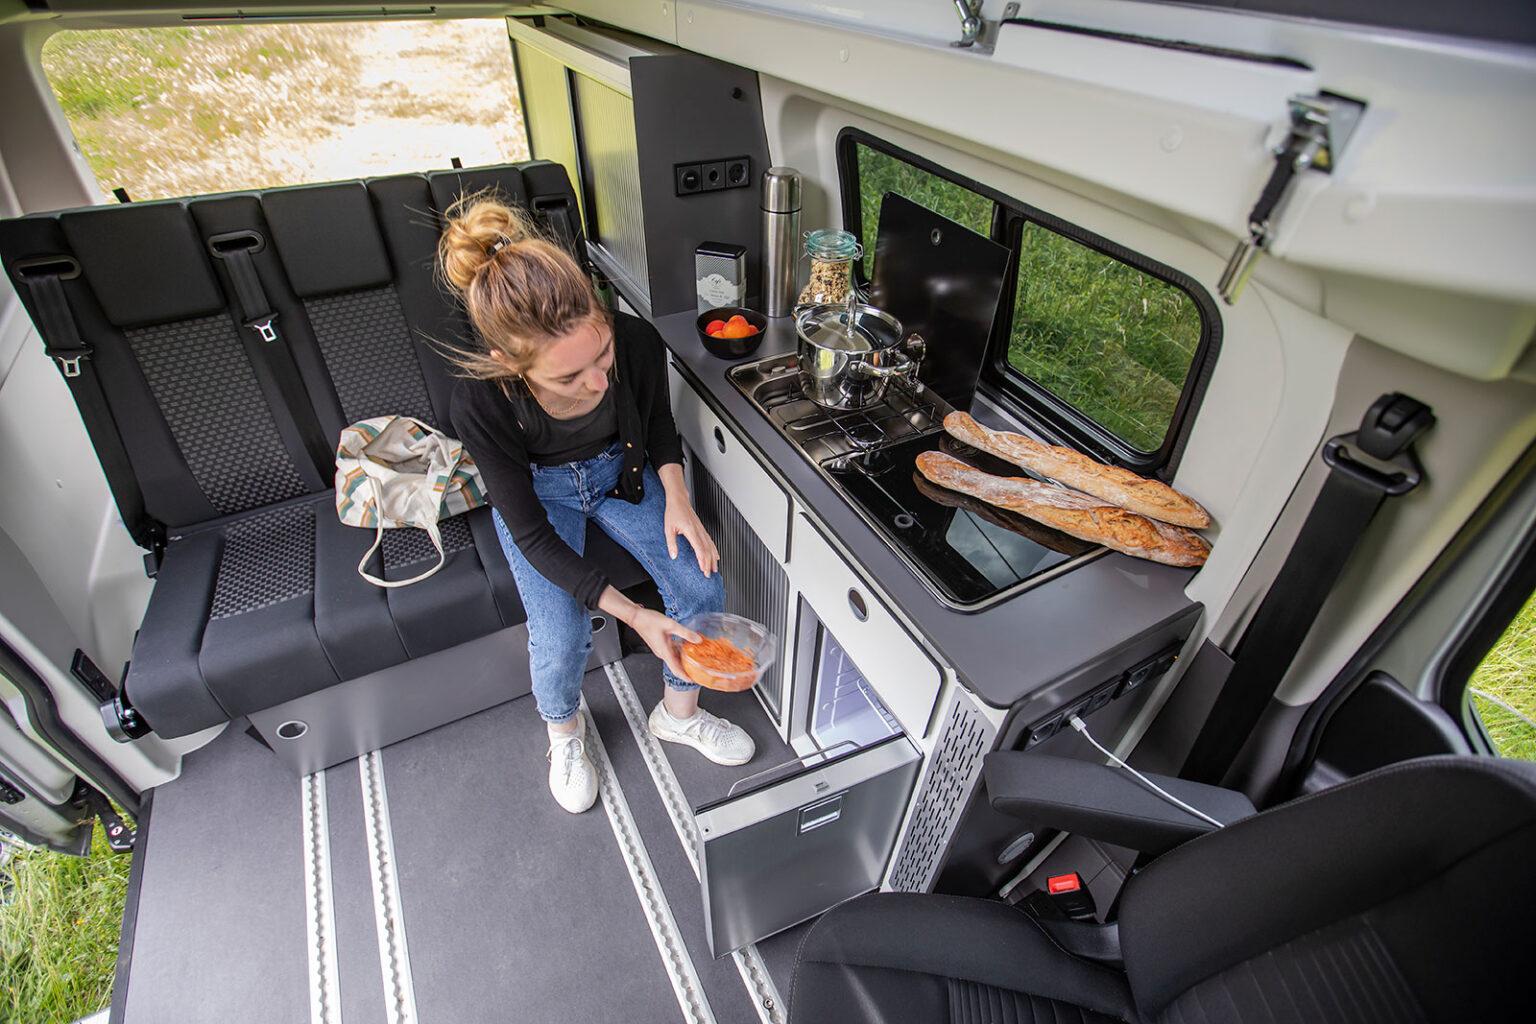 Panama Van Kitchen Equipment